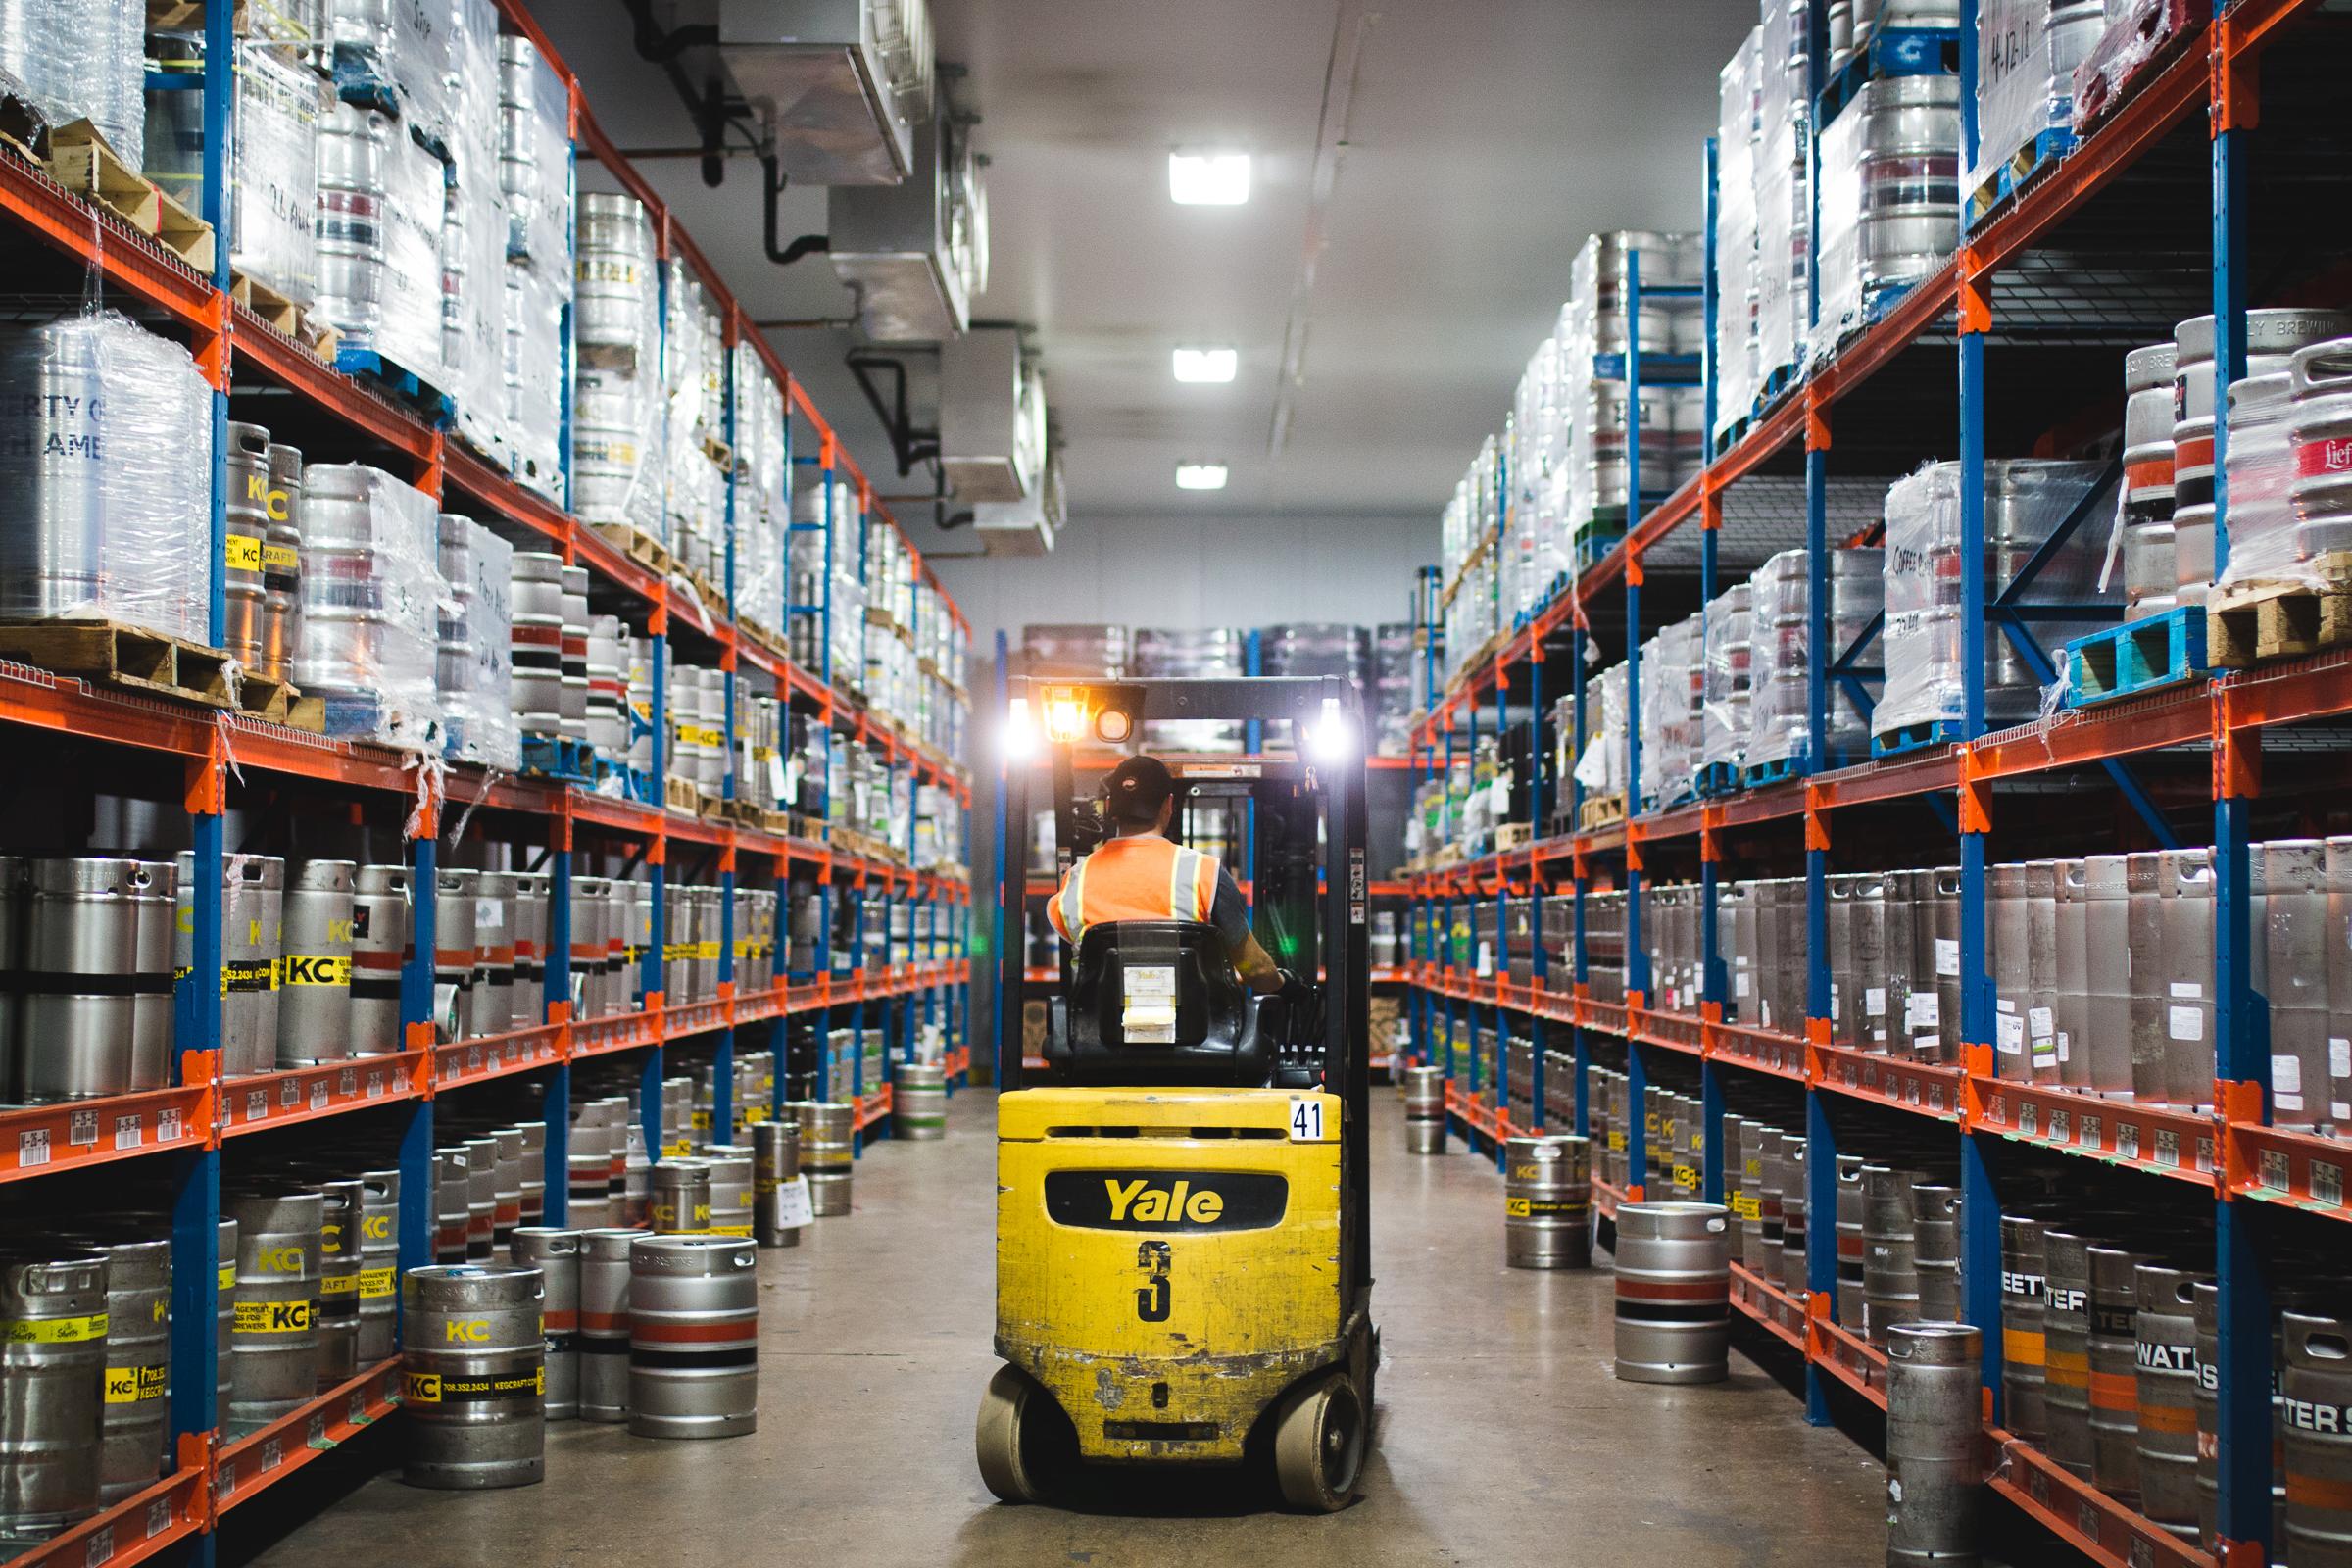 Lakeshore Beverage warehouse